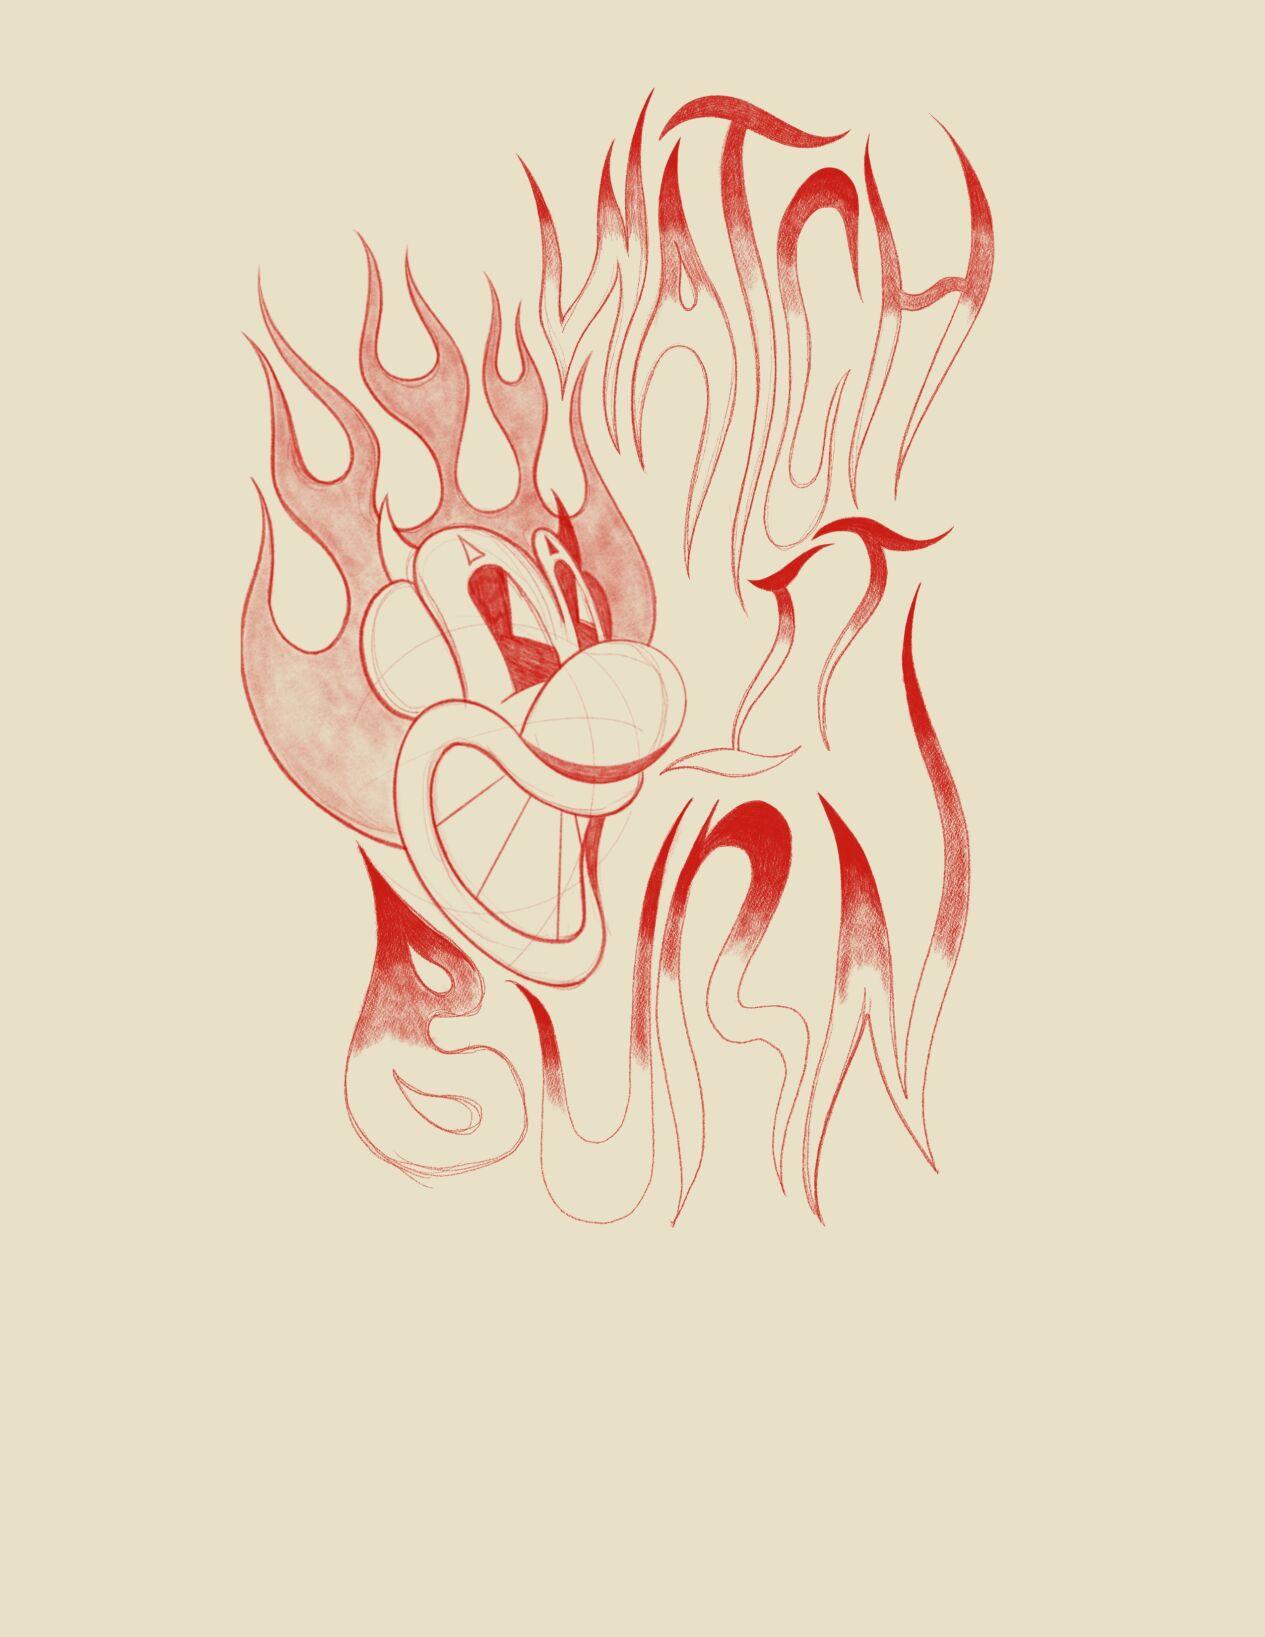 Untitled_Artwork-26.jpg Jake Montoya